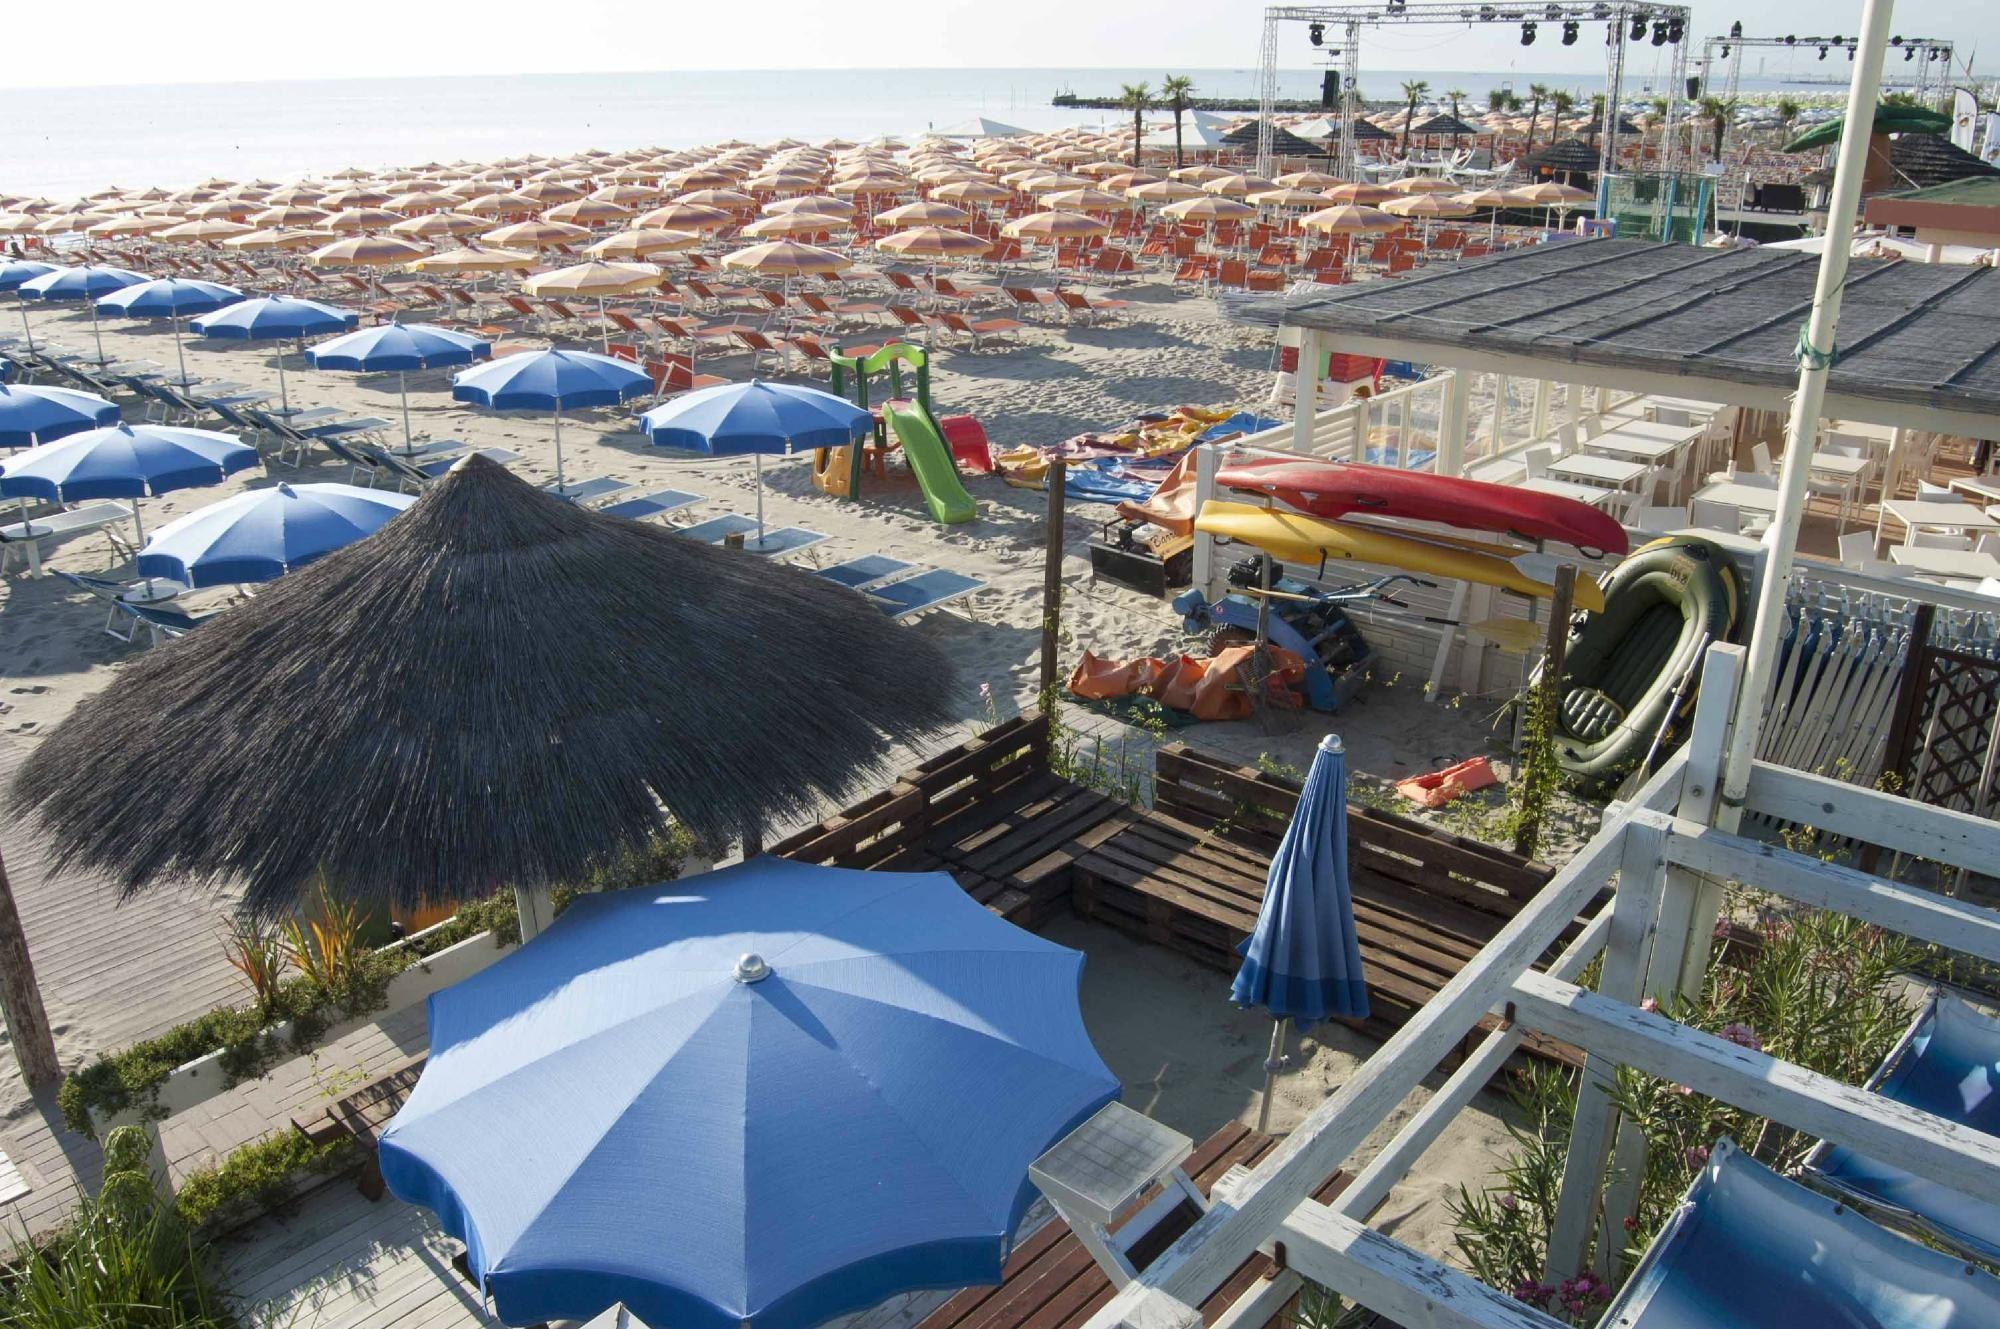 Bagno Flamingo Beach 283 Cervia Milano Marittima, Italy